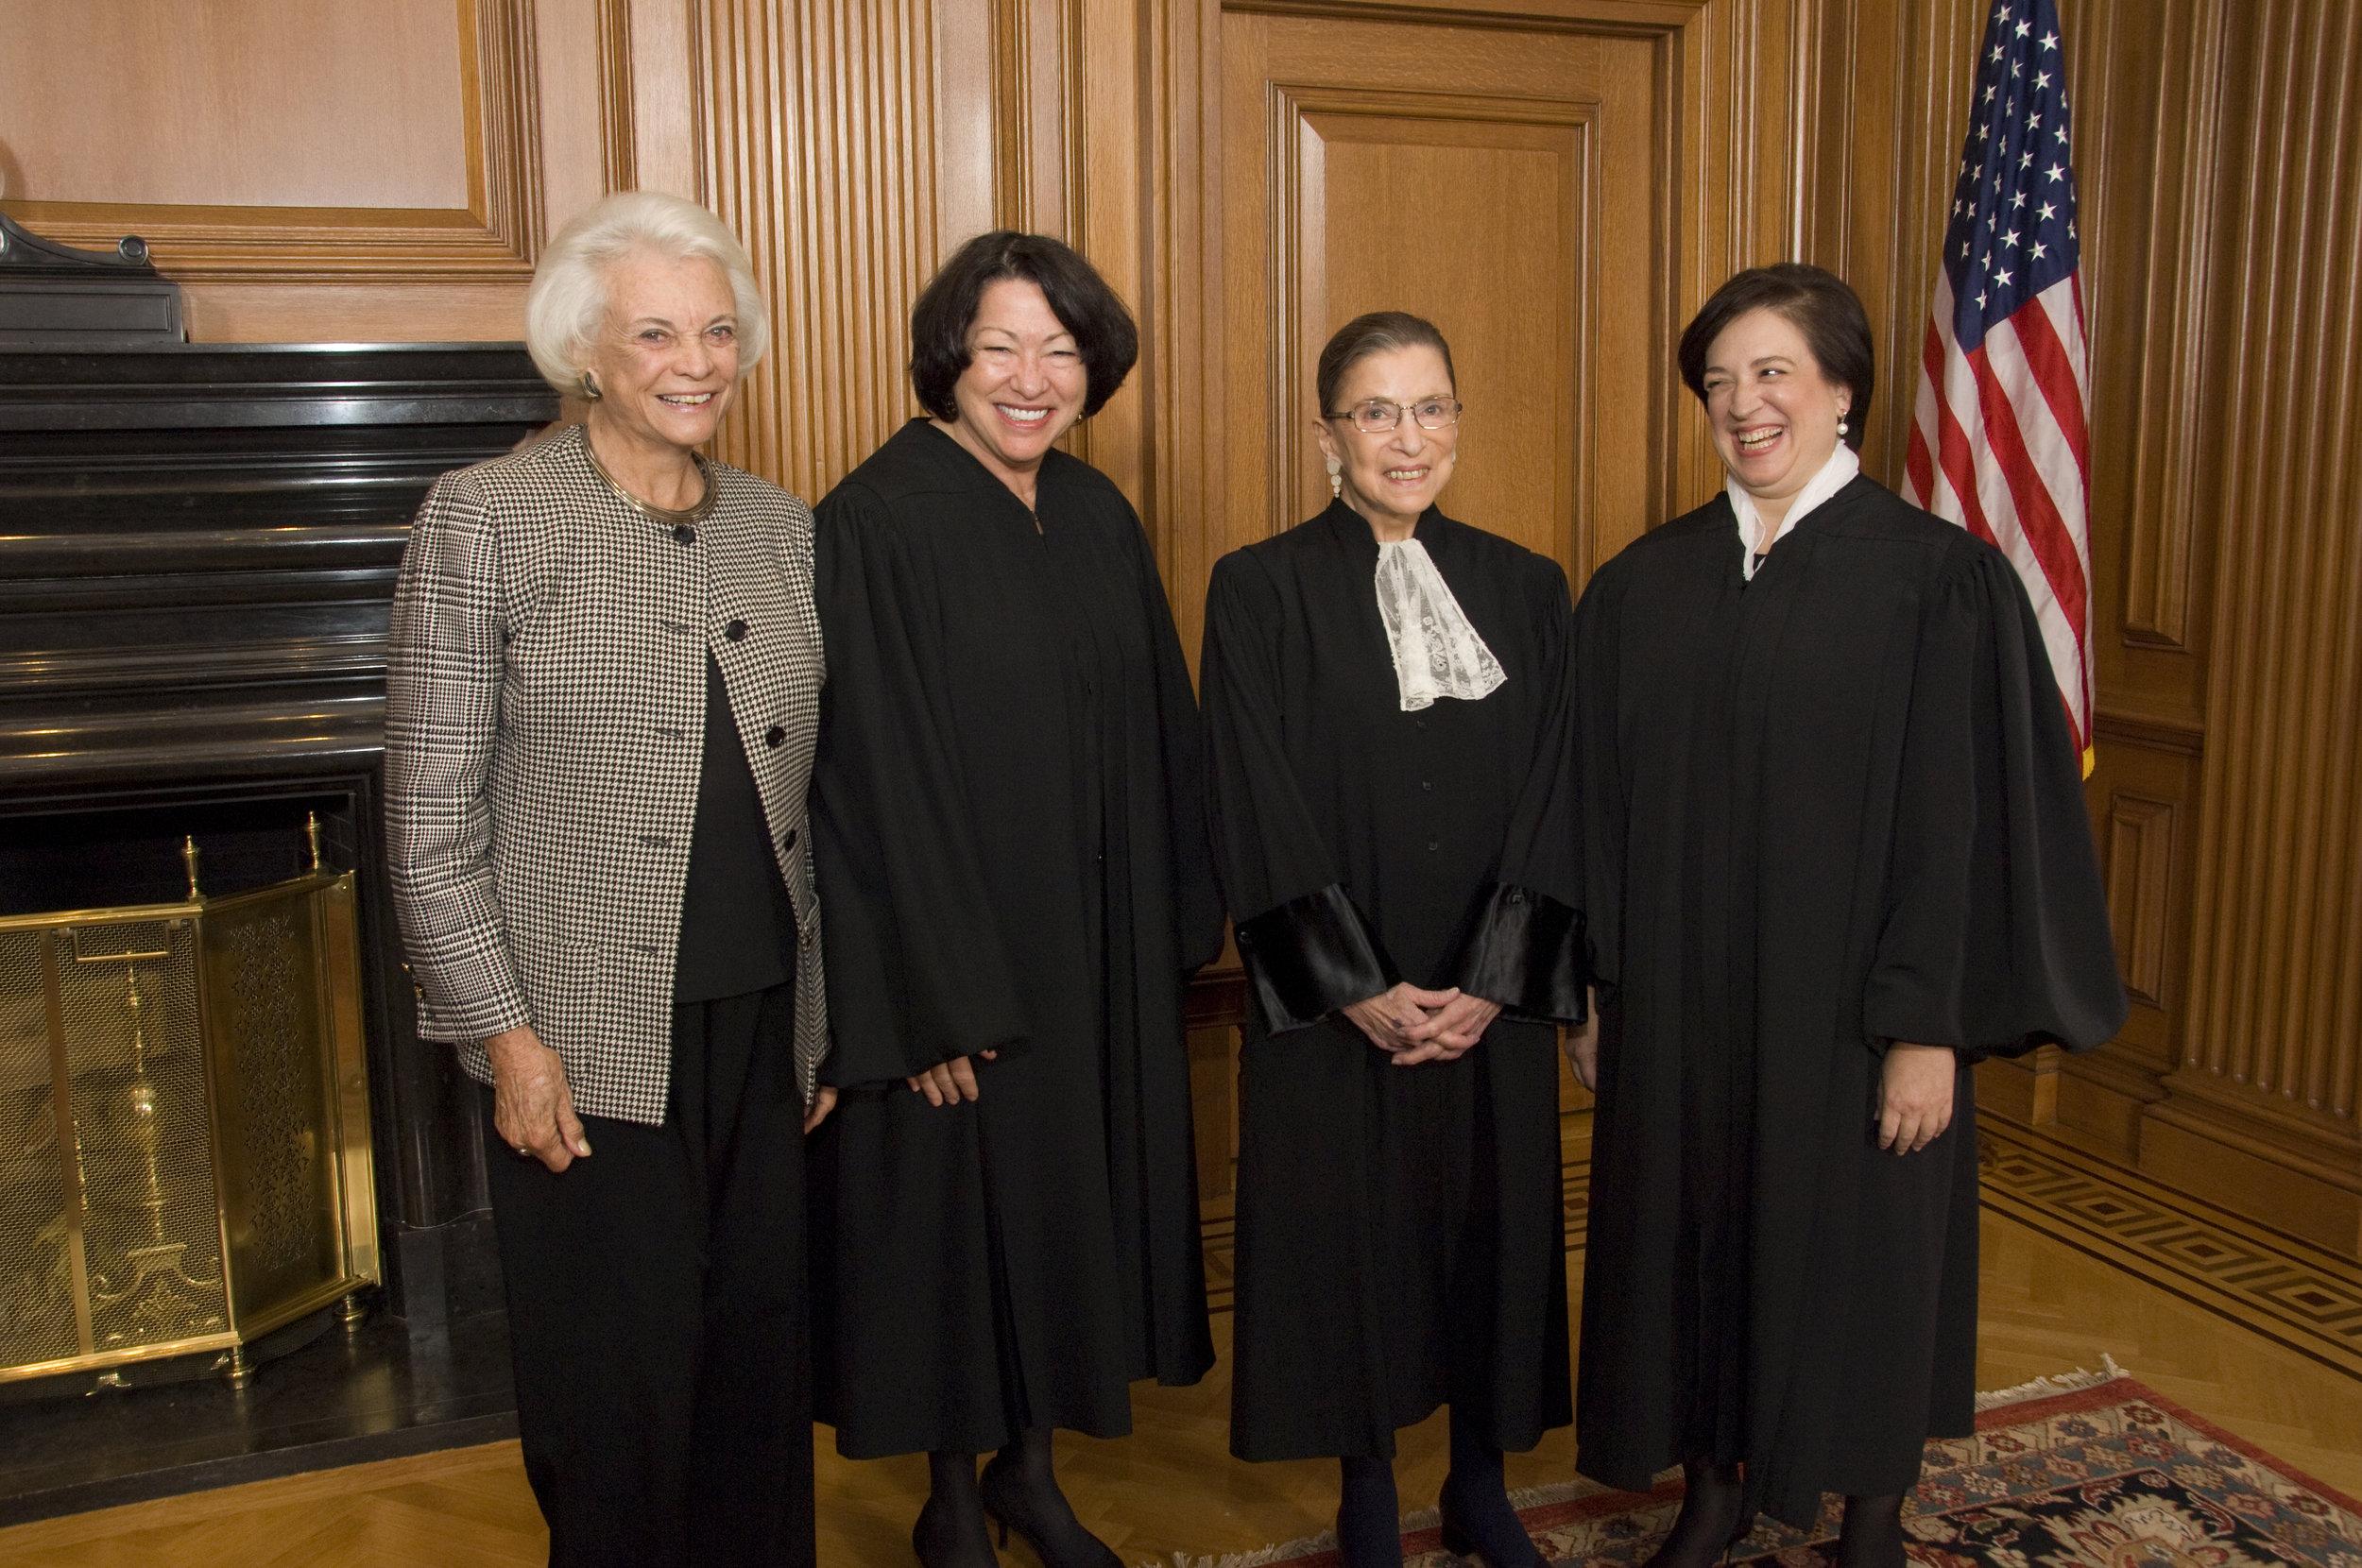 Supreme Court Justices Sandra Day O'Connor, Sonia Sotomayor, Ruth Bader Ginsburg and Elena Kagan.